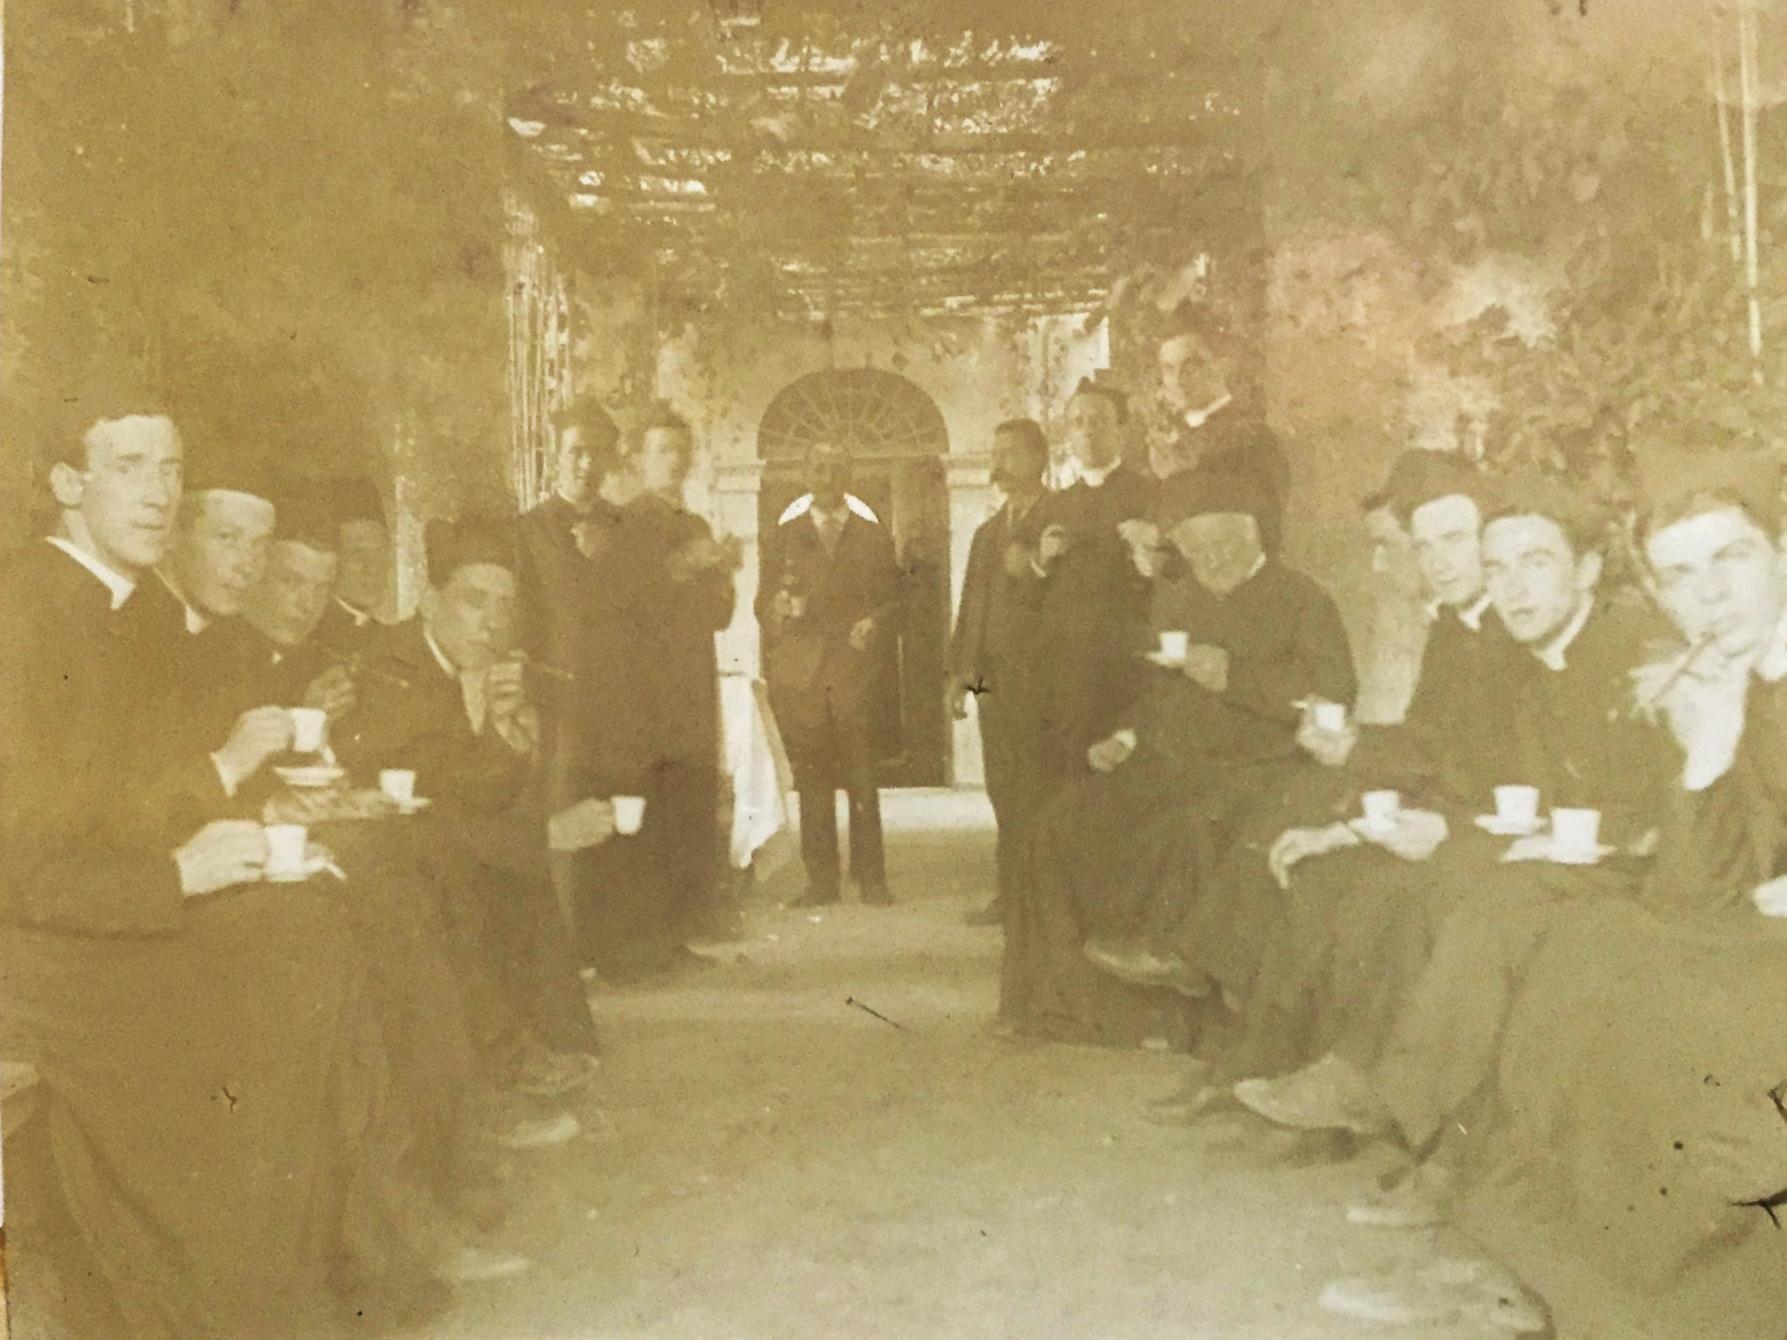 Coffee after lunch, Monte Porzio, 1909